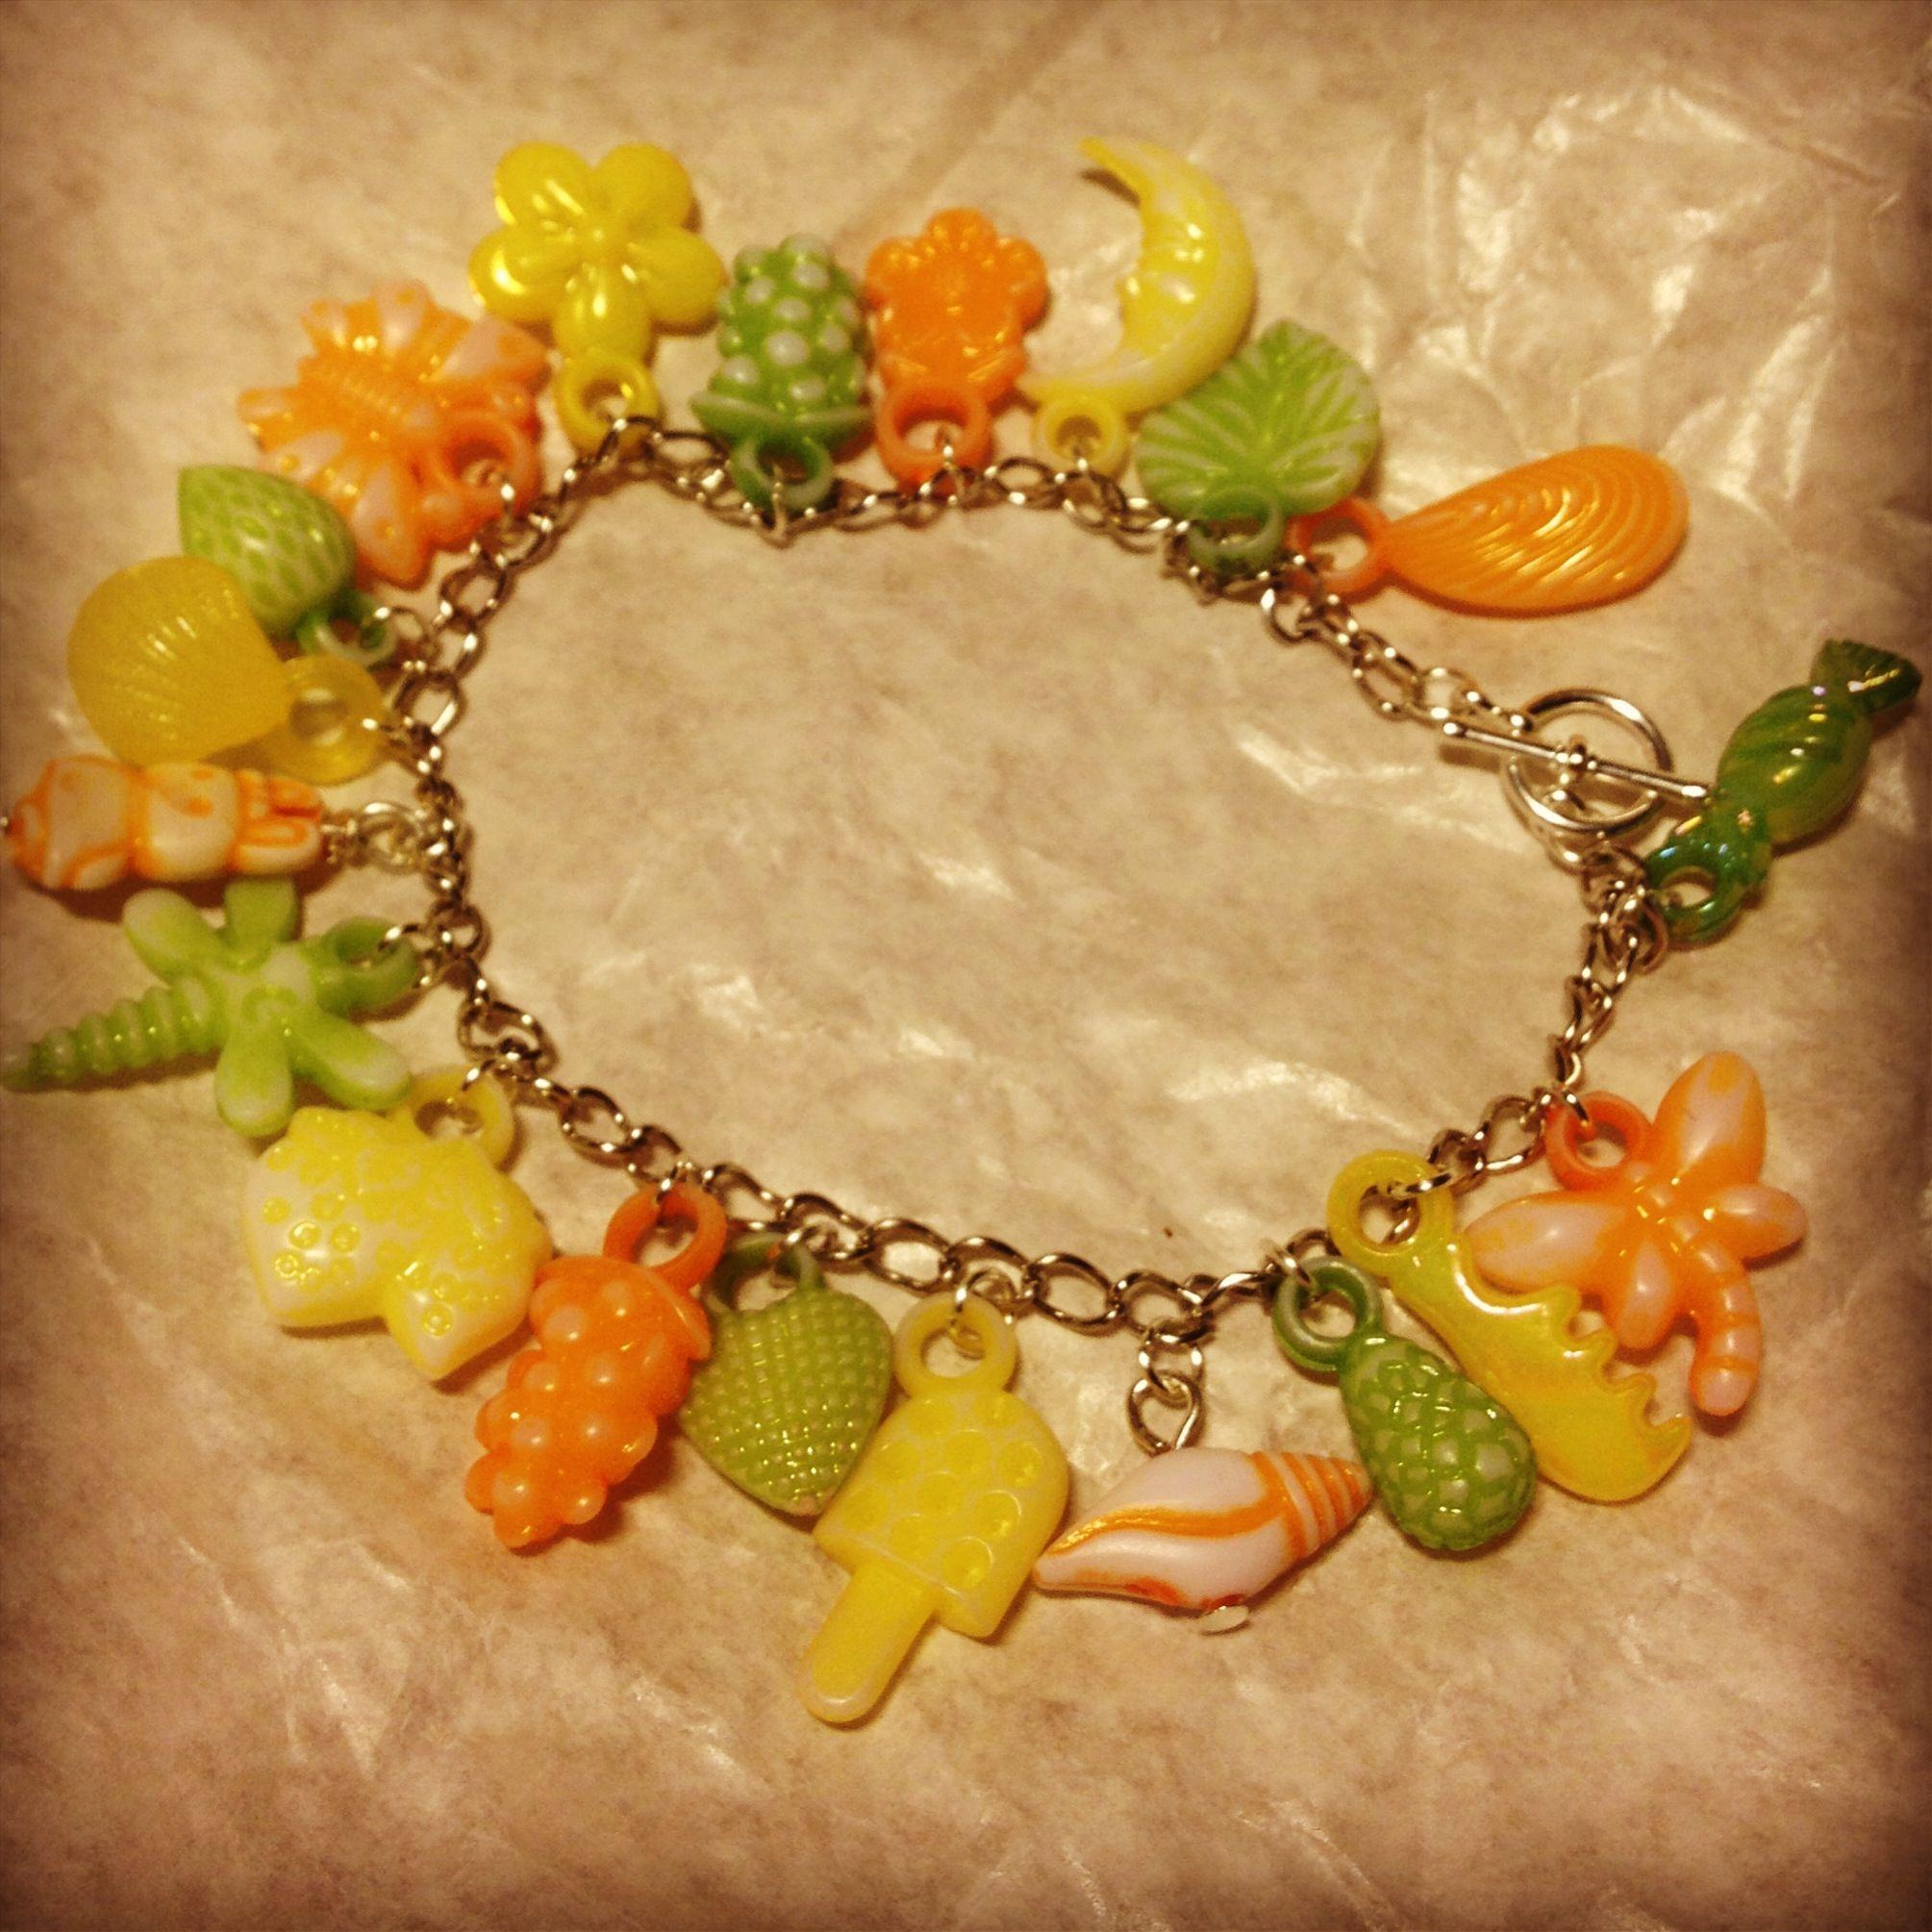 Citrus gum-ball charm bracelet